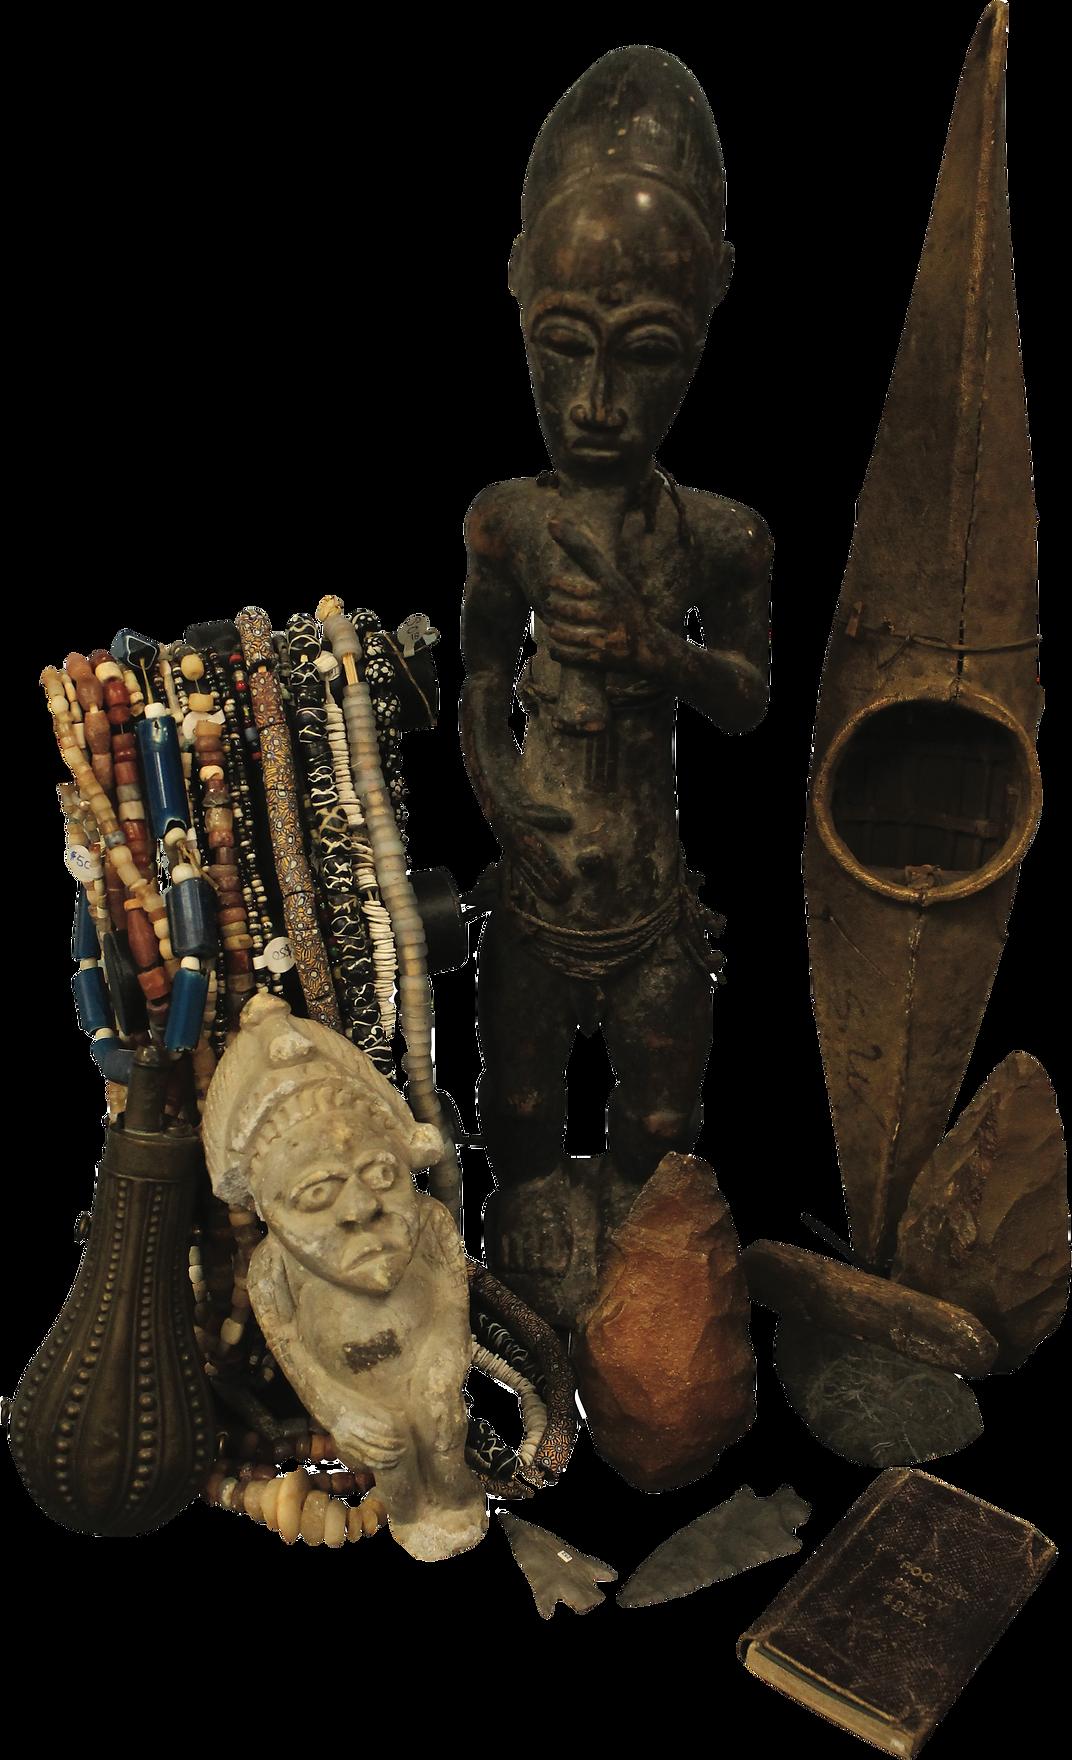 Ethnographic Prehistoric handaxe native american arrowhead